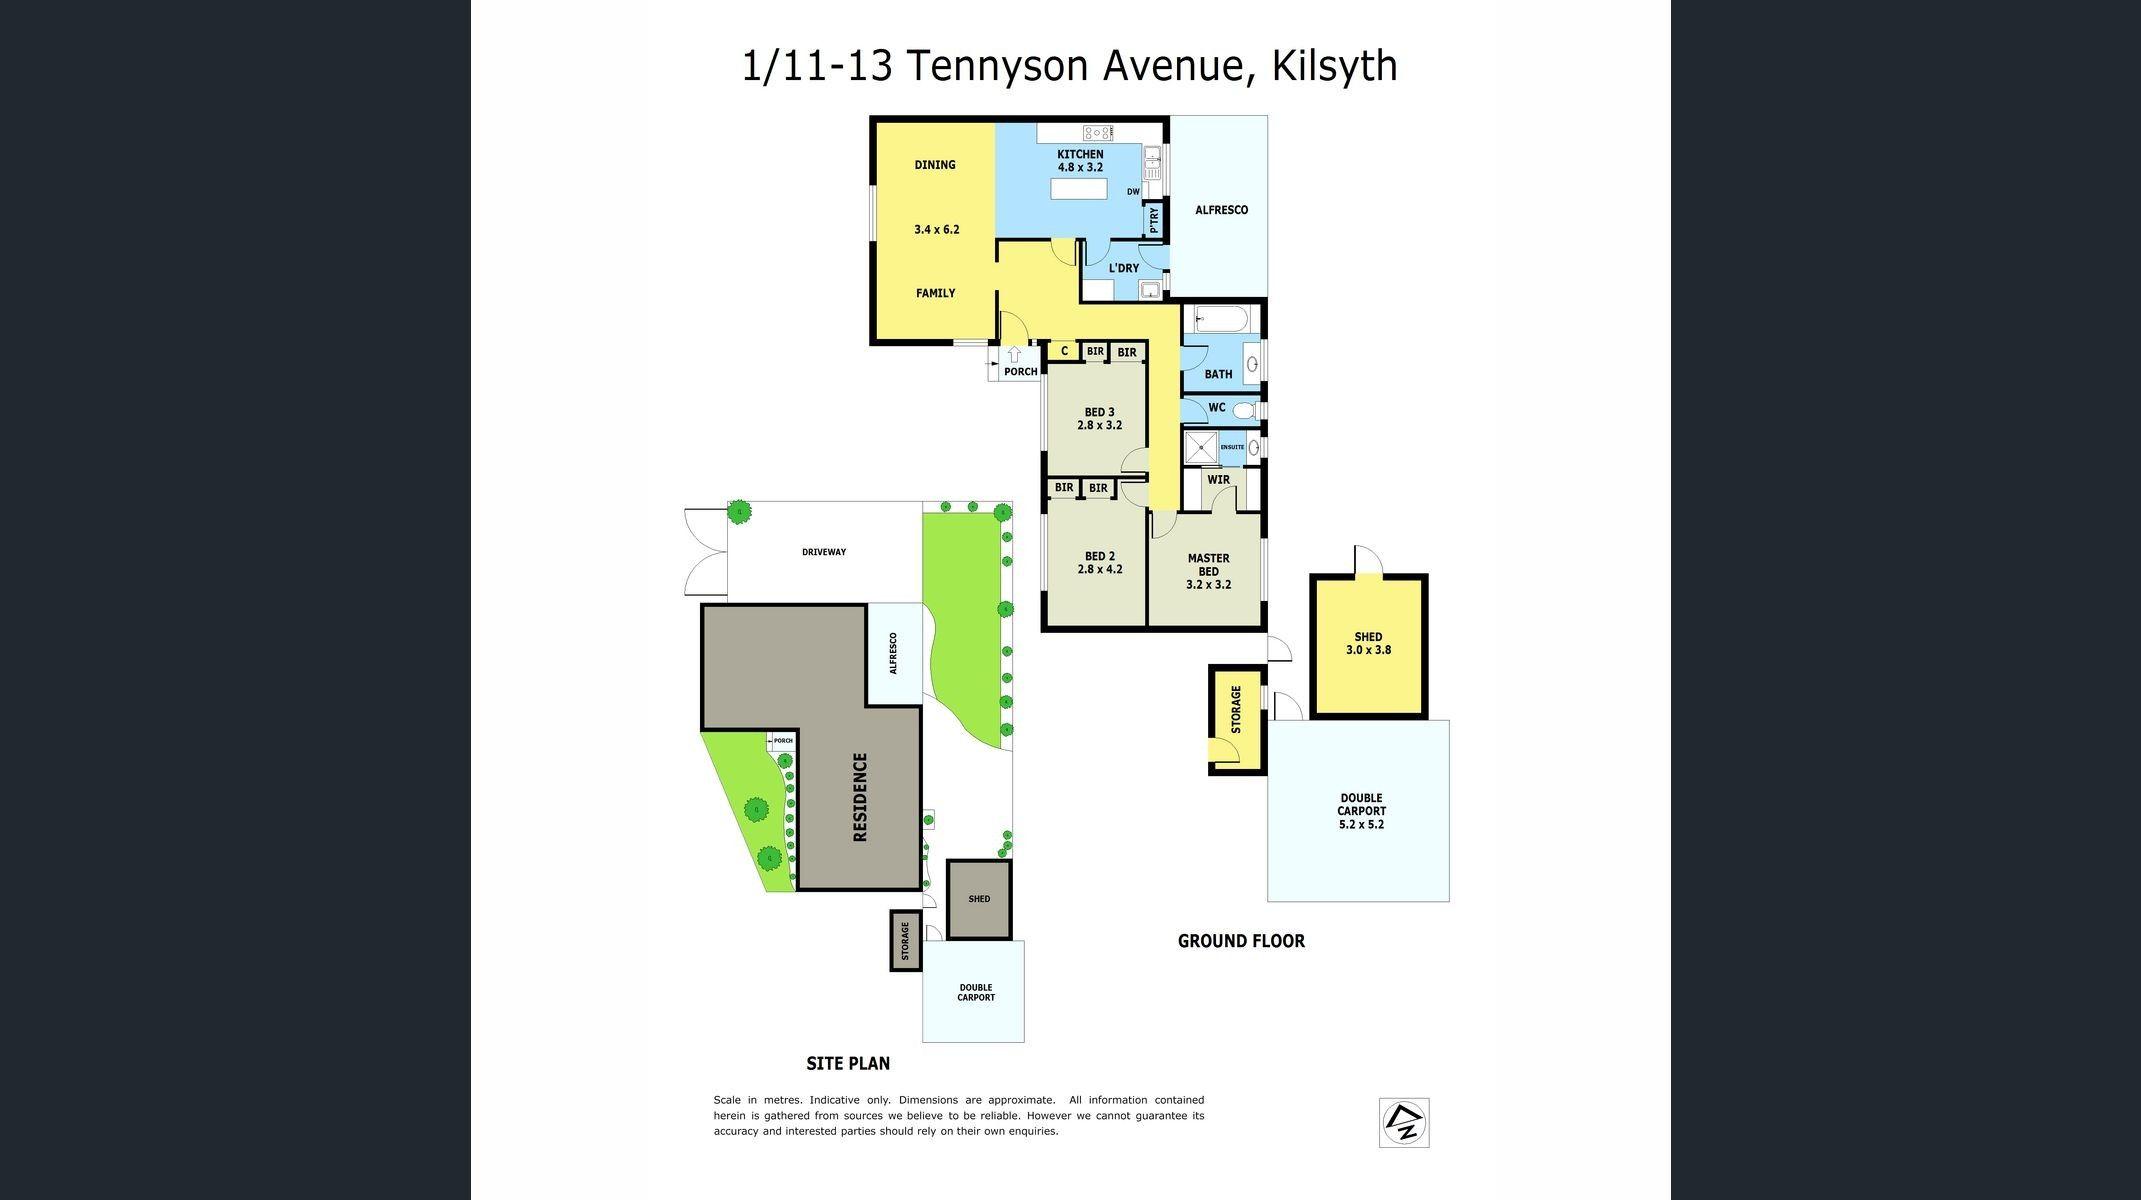 1/11-13 Tennyson Avenue Kilsyth